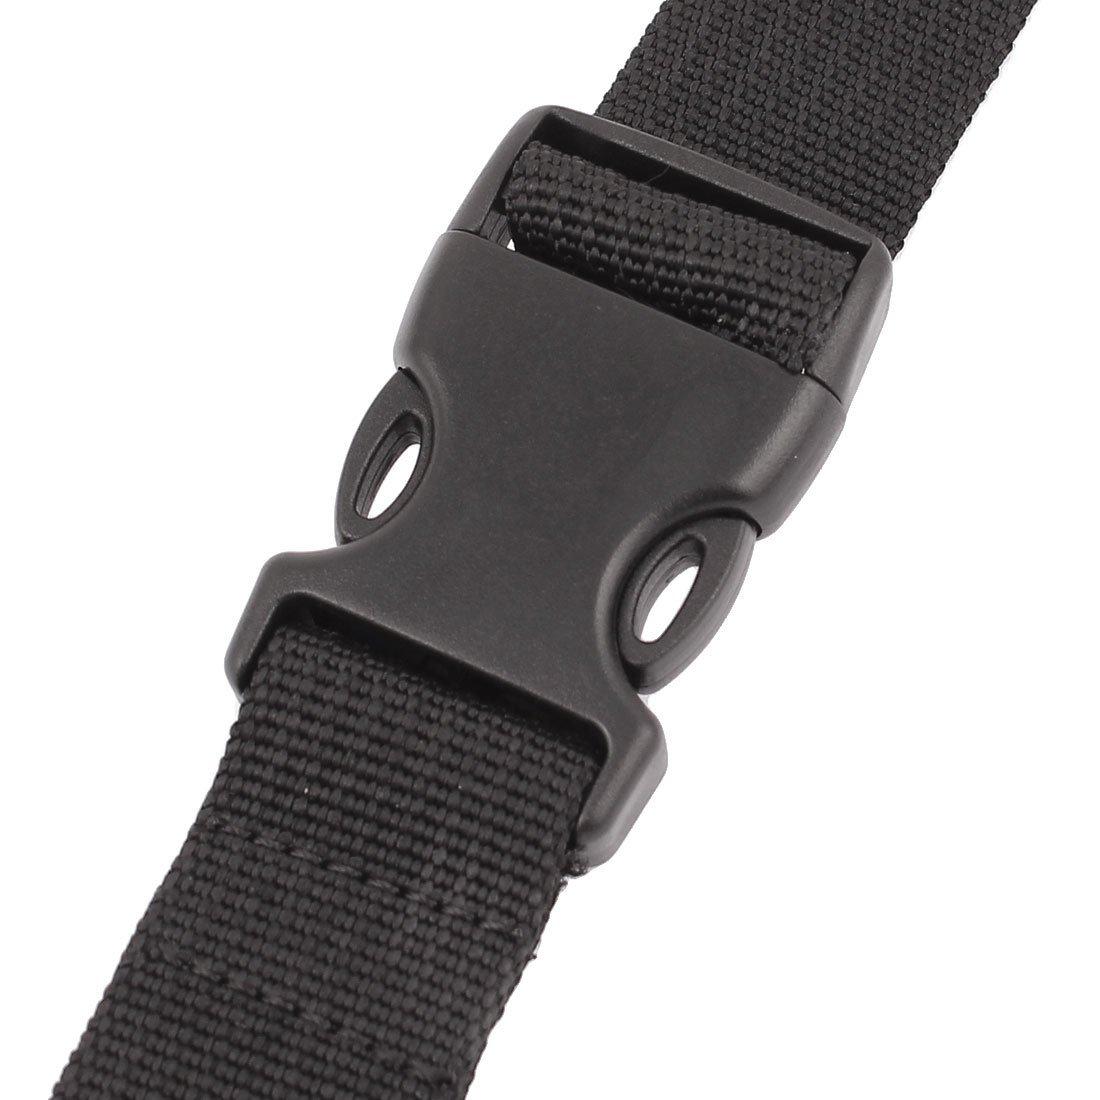 EbuyChX Plastic Buckle Backpack Bagahe Baggage Strap Belt 2M Long 25mm Lapad